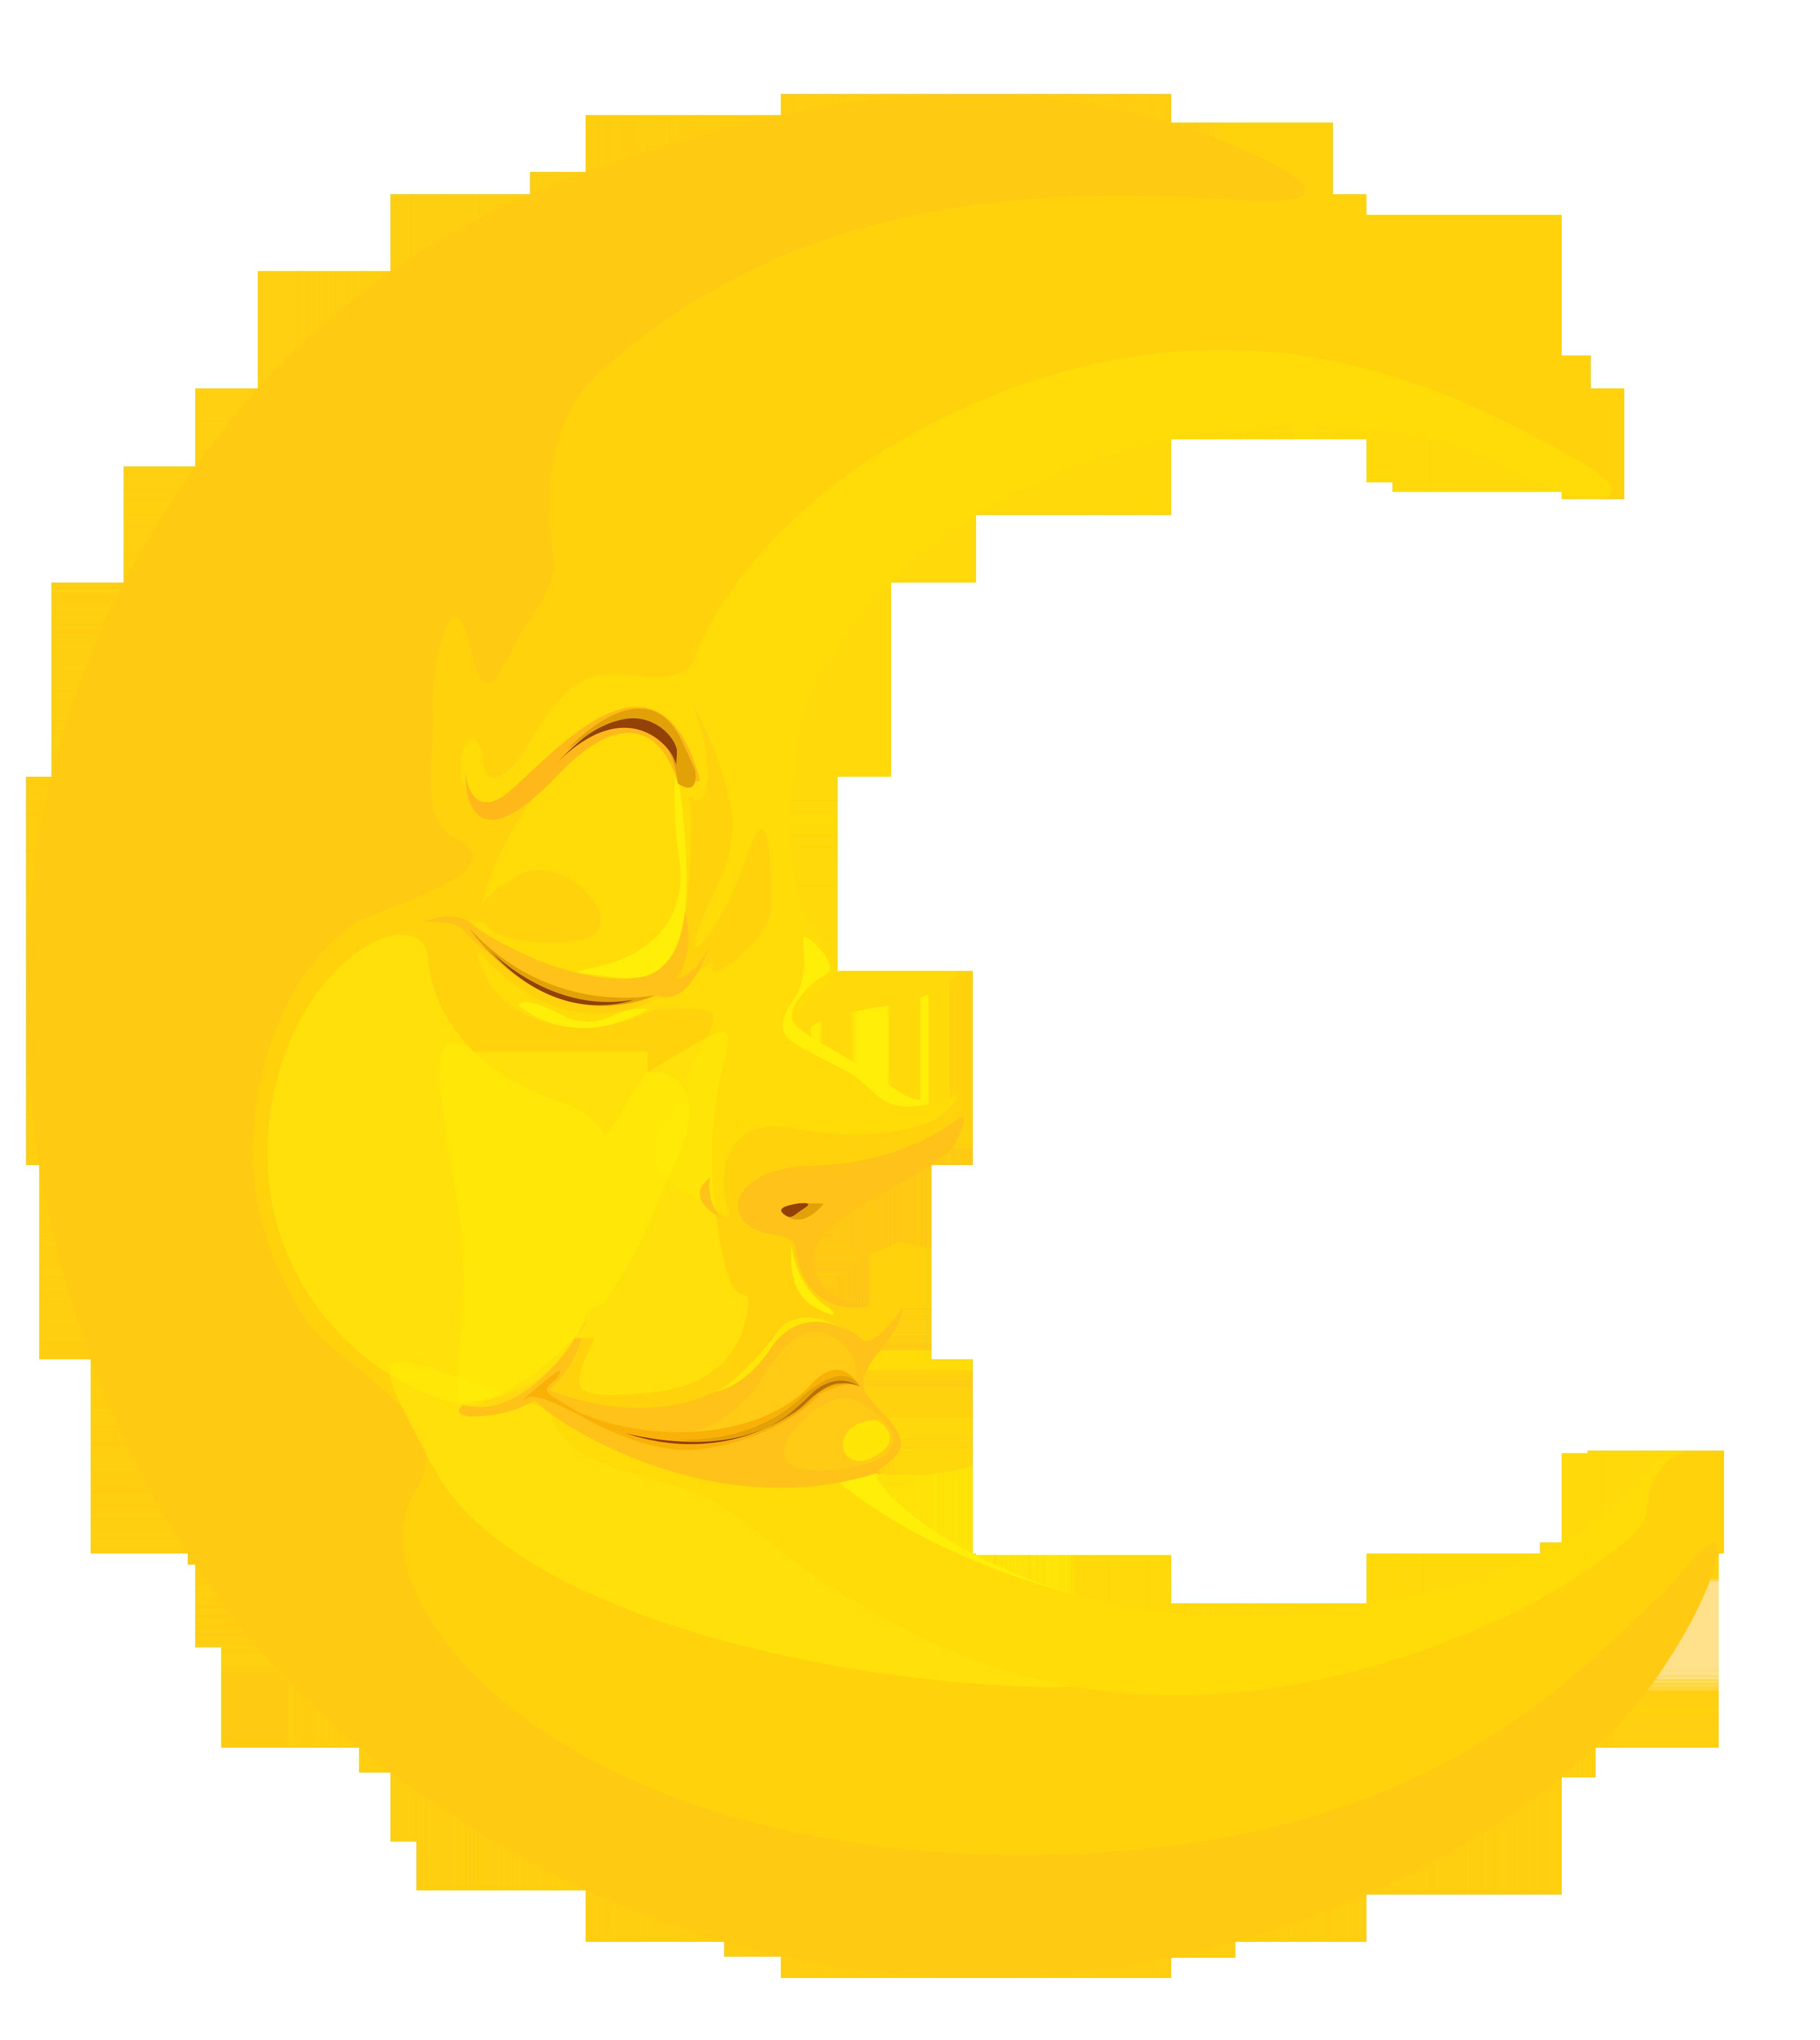 moon clipart u0026middot; moon clipart-moon clipart u0026middot; moon clipart-1